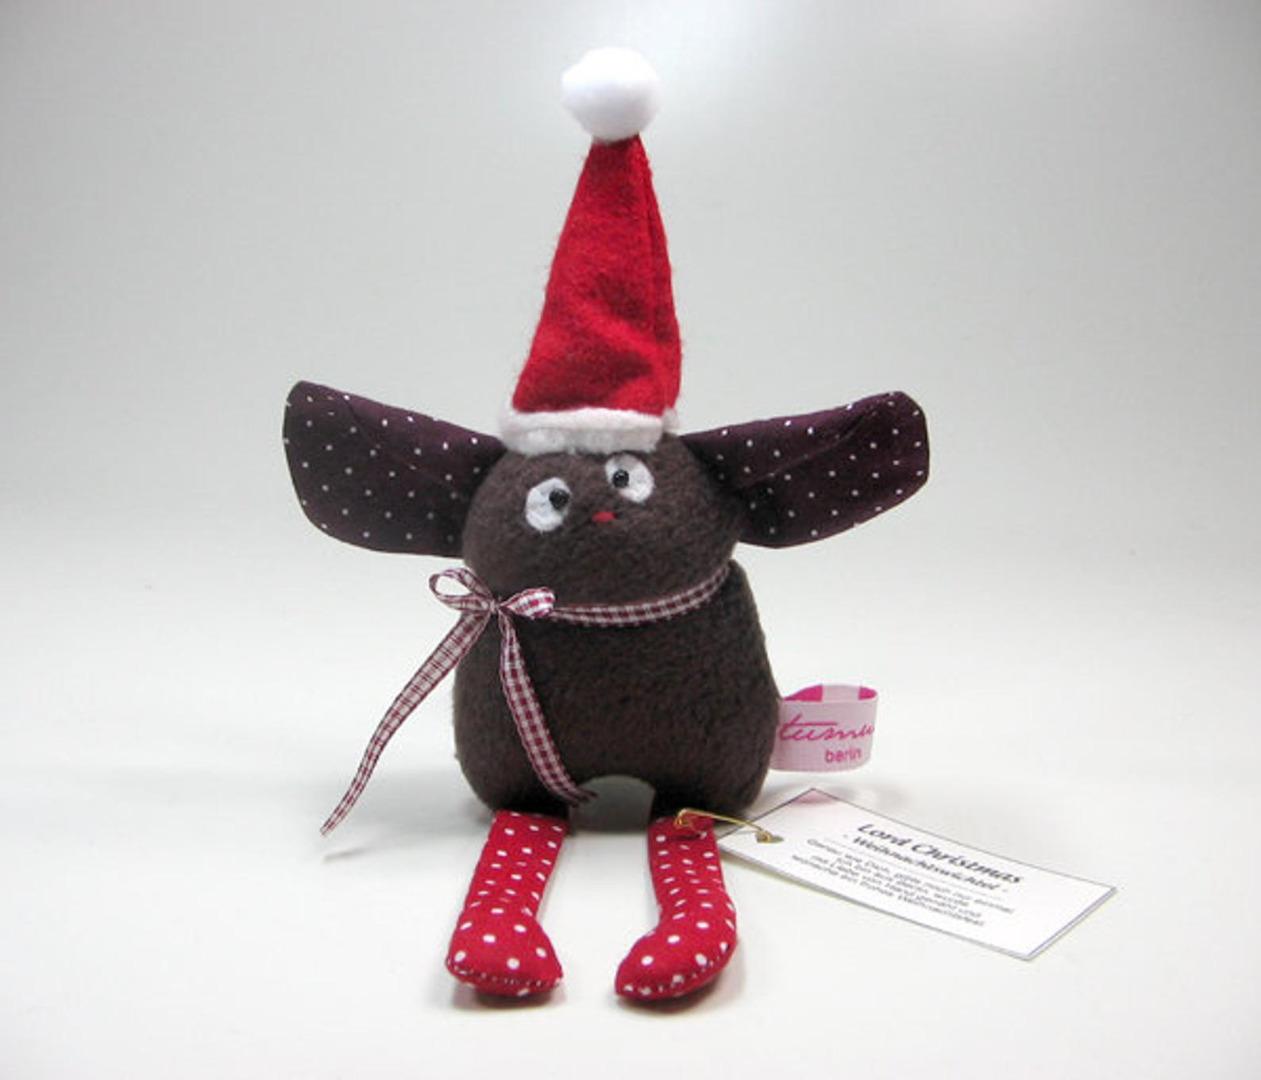 Lord Christmas - Weihnachtswichtel